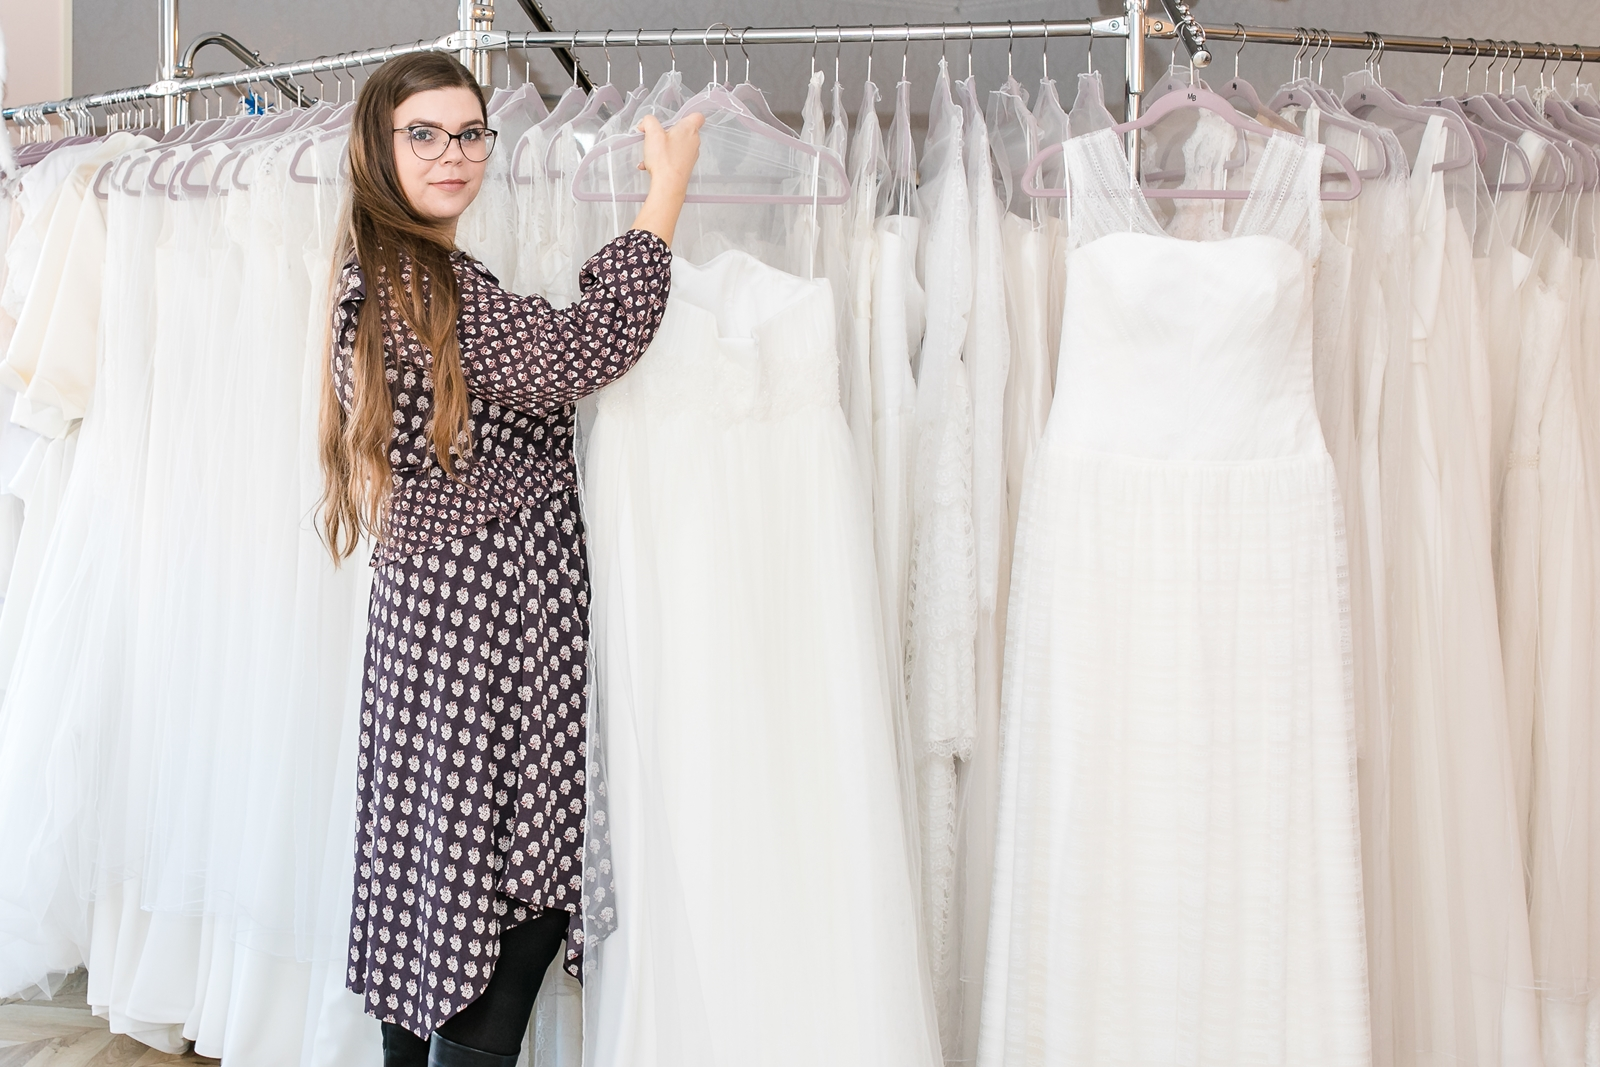 Bridal-Store-Brautkleider-Shop-Atelier-mona-berg-Brautkleider-Hamburg-Brautmode-vintage-boho-3